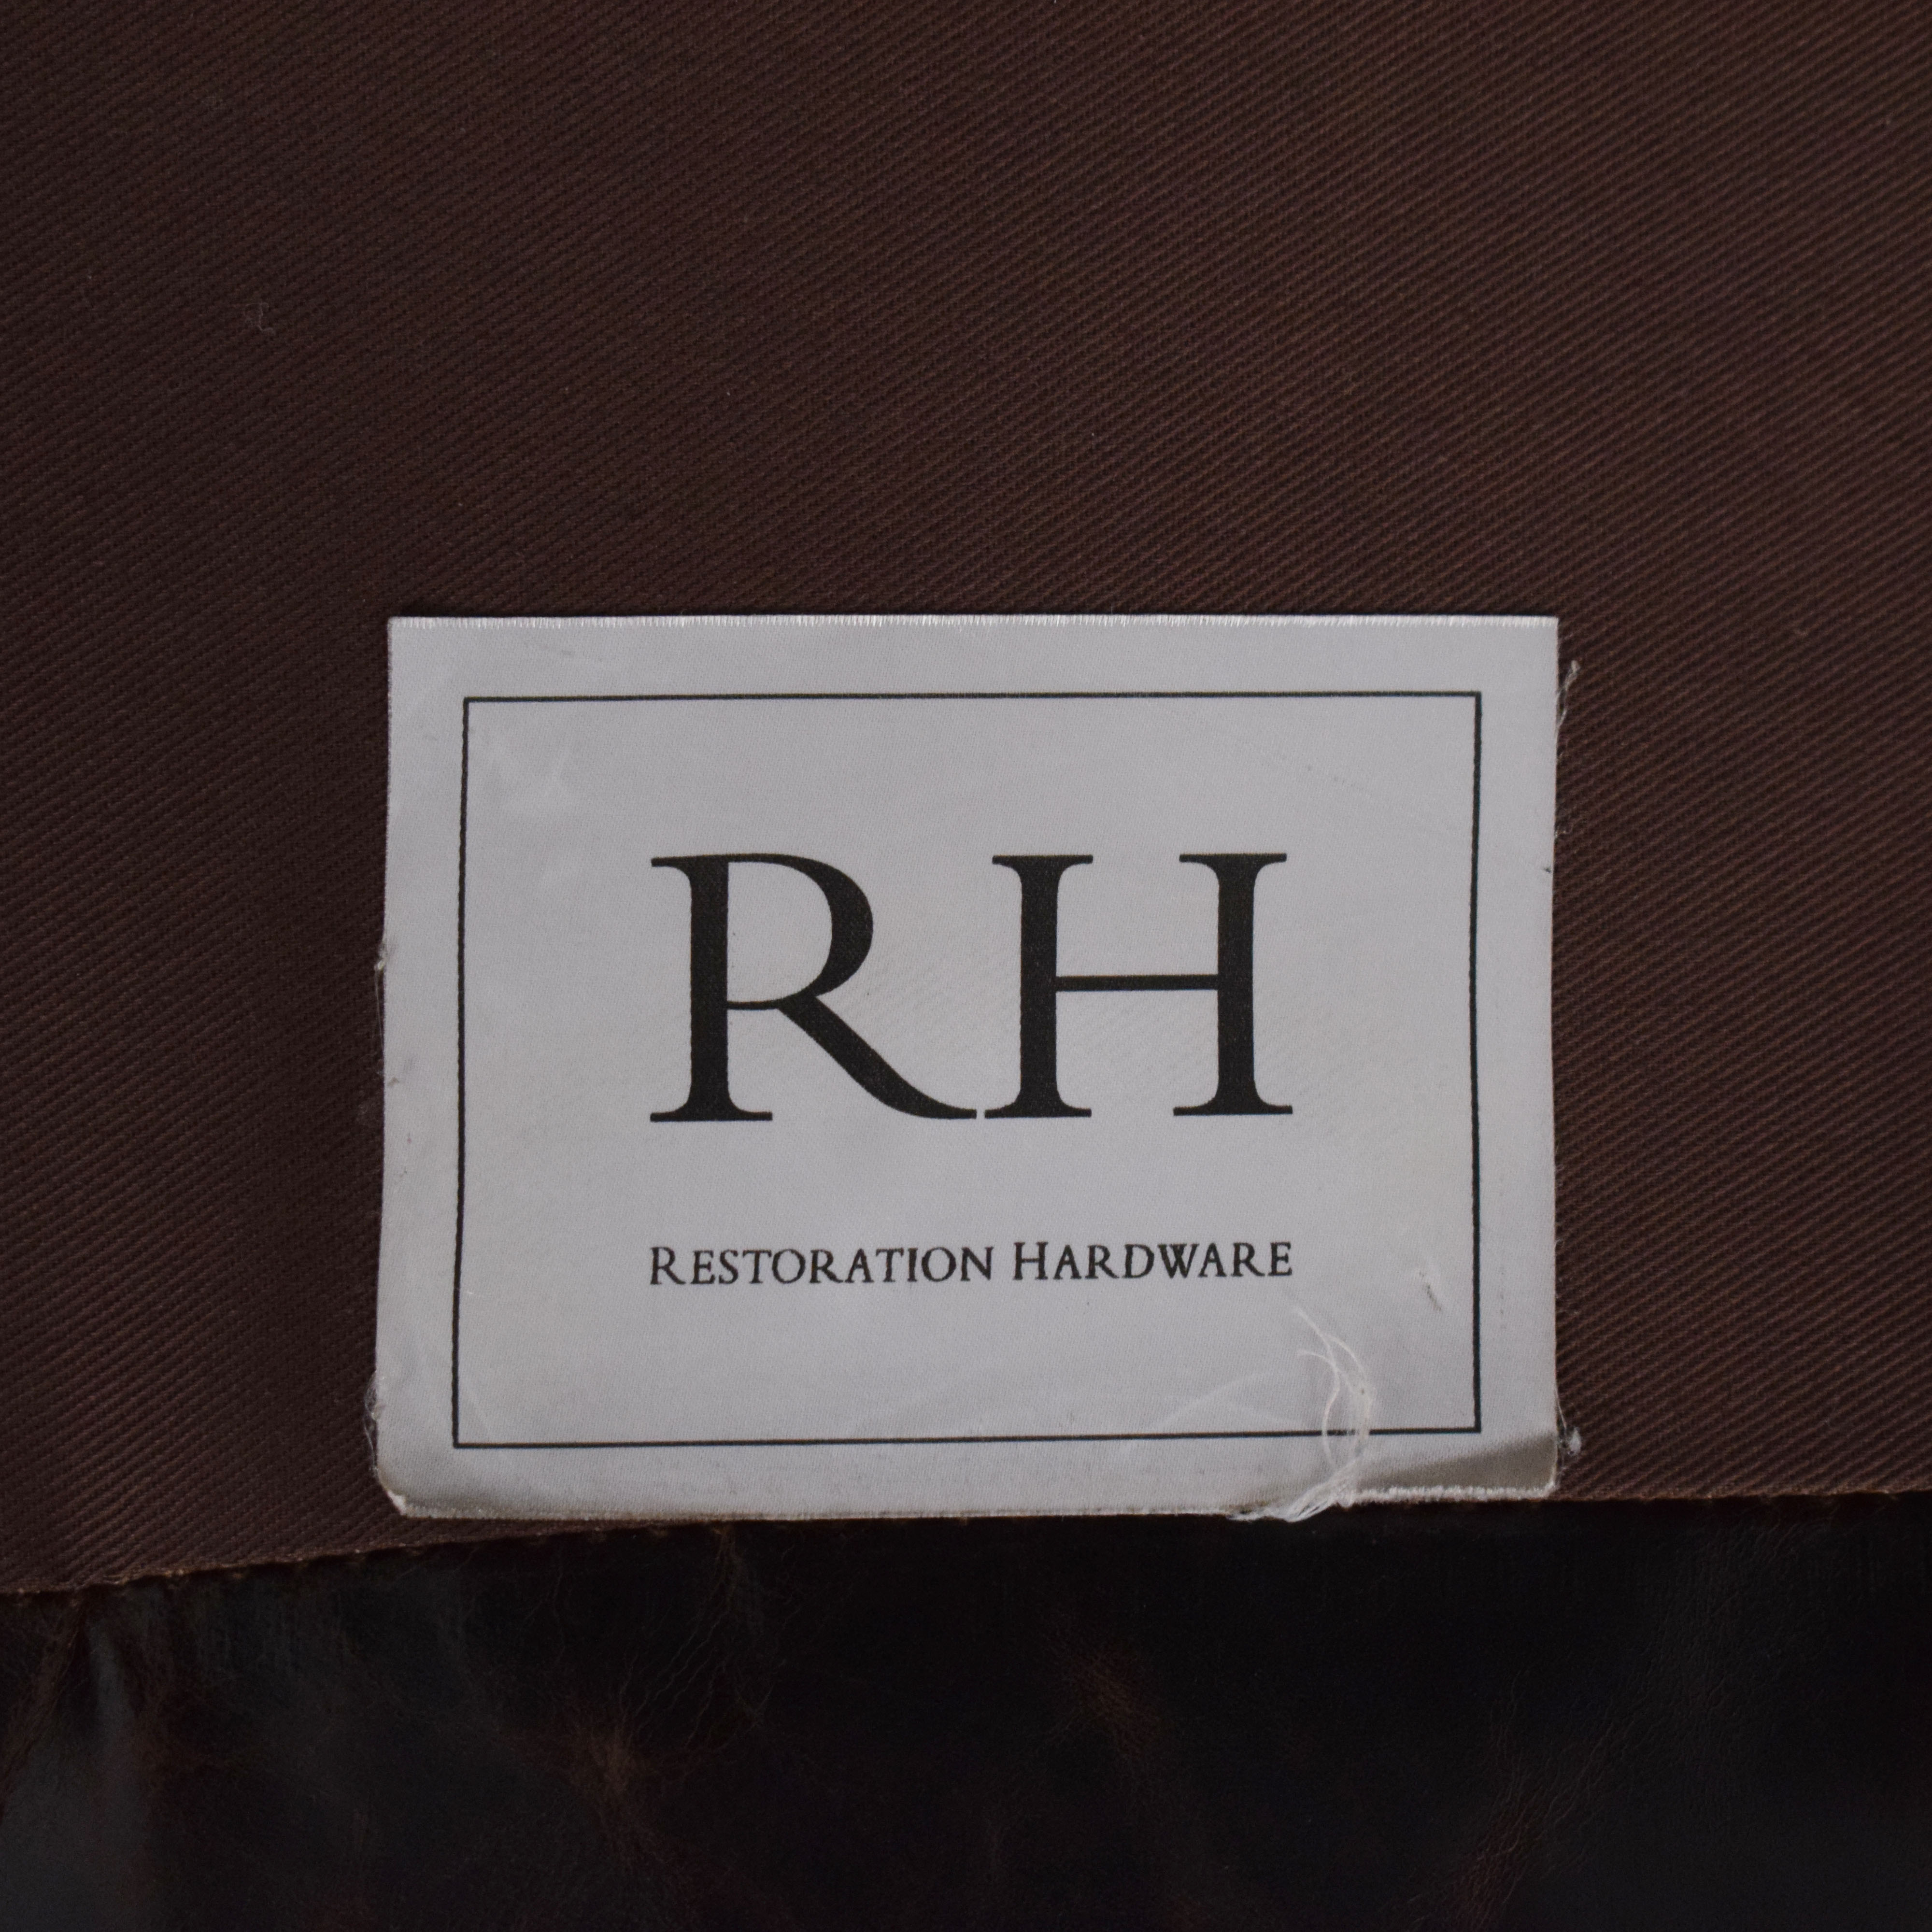 Restoration Hardware Restoration Hardware Original Lancaster Leather Sofa